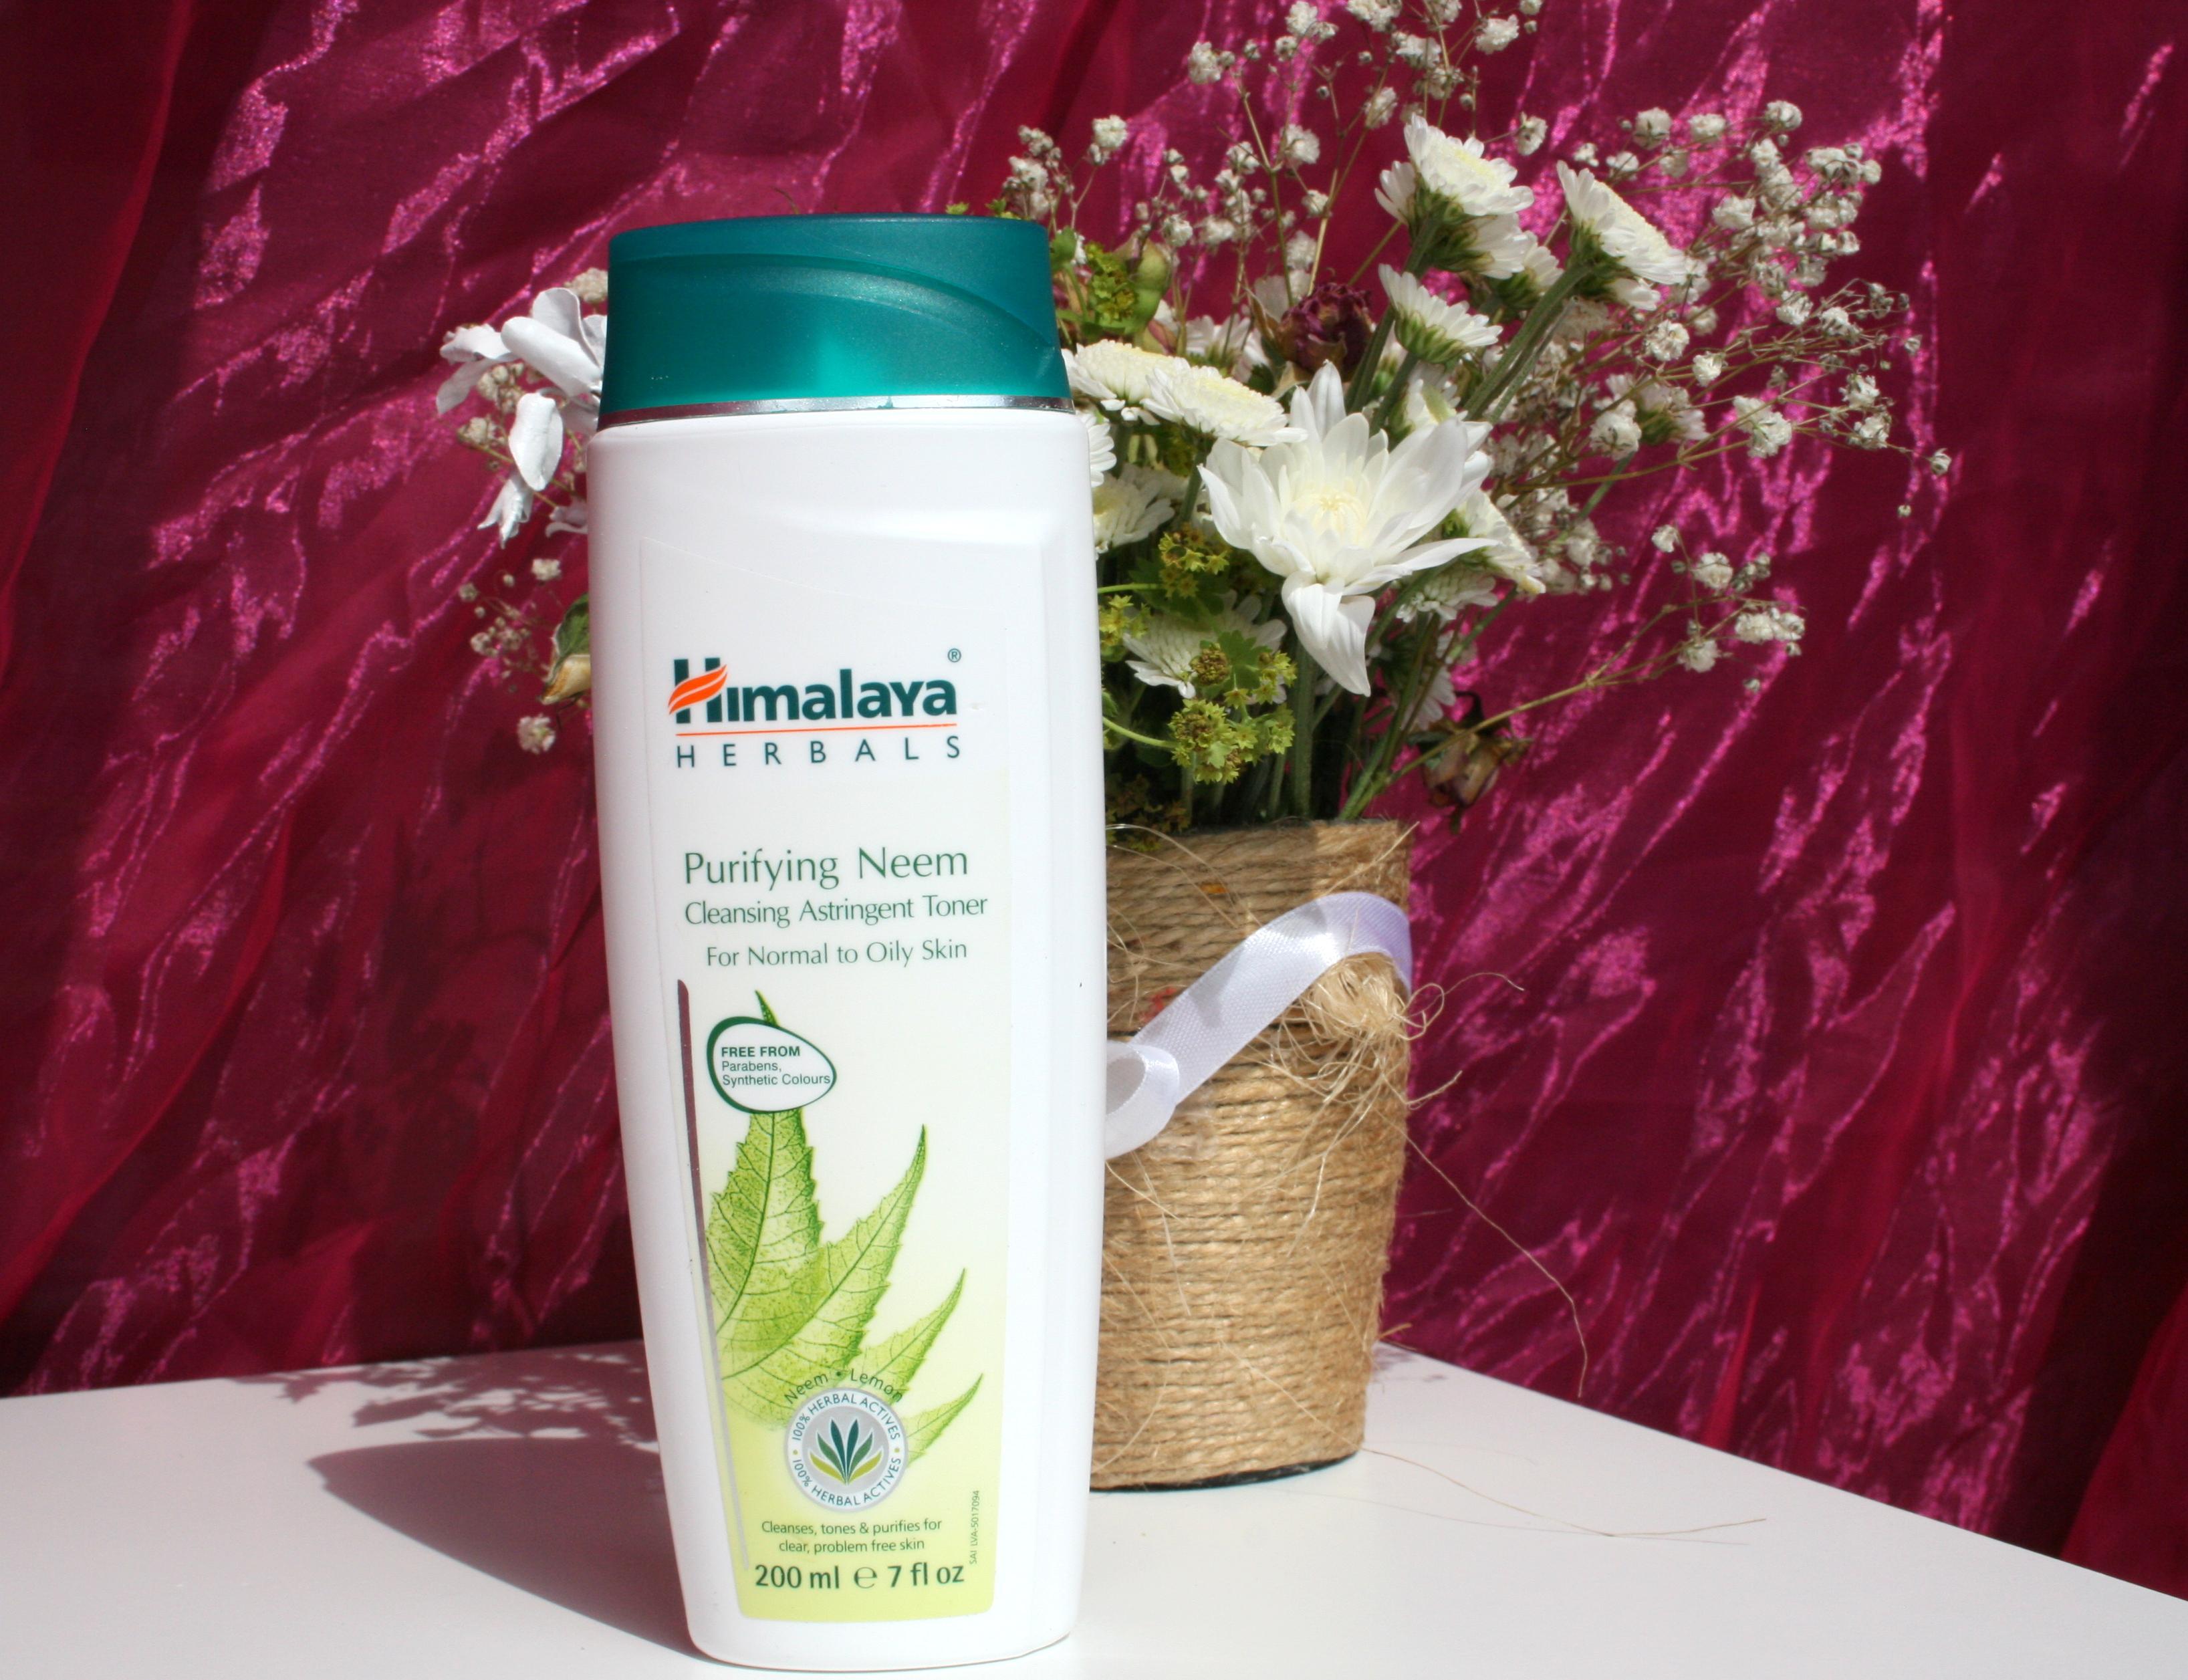 Himalaya Herbals Neem